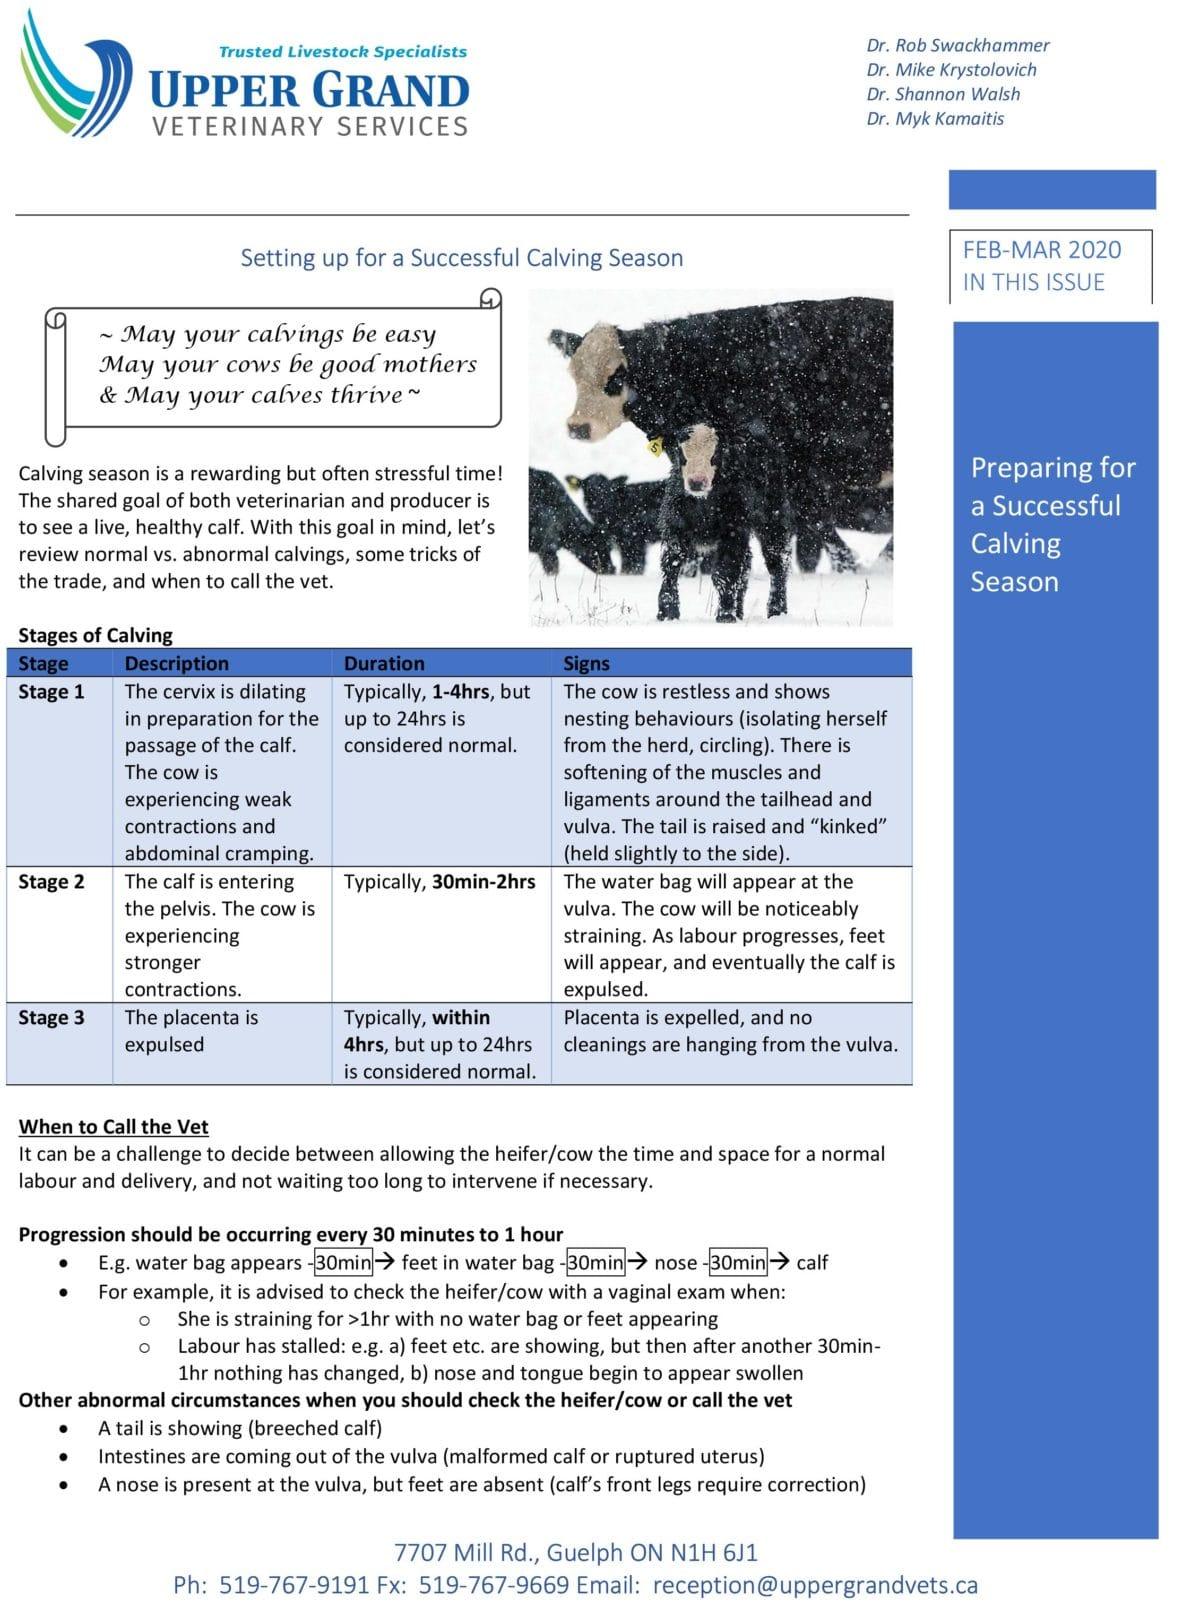 UGVS-Newsletter_Feb-Mar_2020-1-copy-1200x1607.jpg